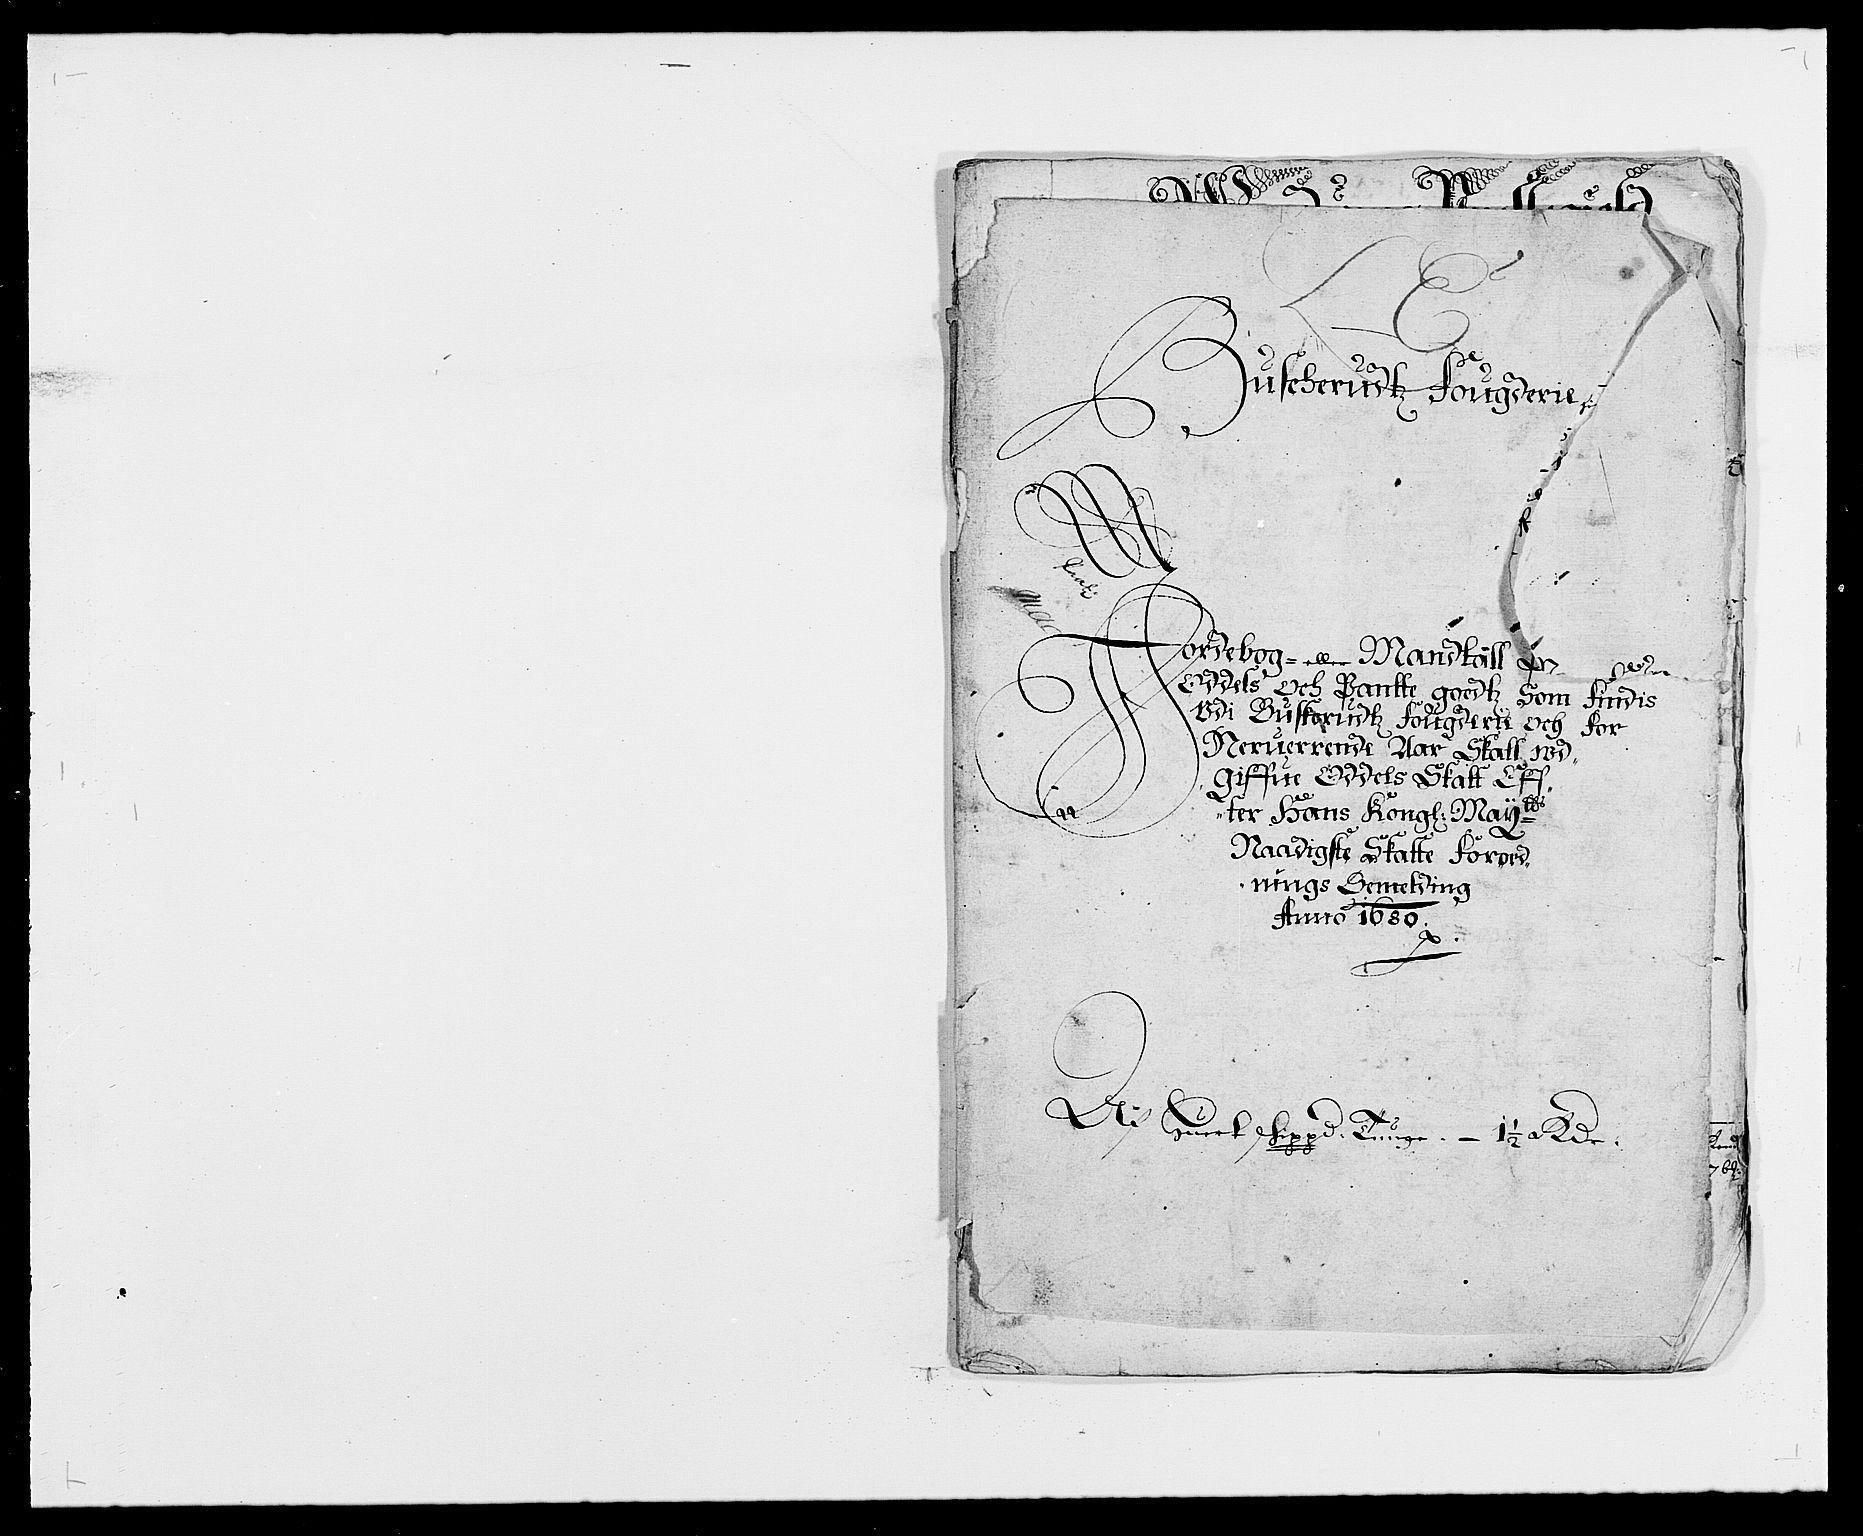 RA, Rentekammeret inntil 1814, Reviderte regnskaper, Fogderegnskap, R25/L1675: Fogderegnskap Buskerud, 1678-1681, s. 120